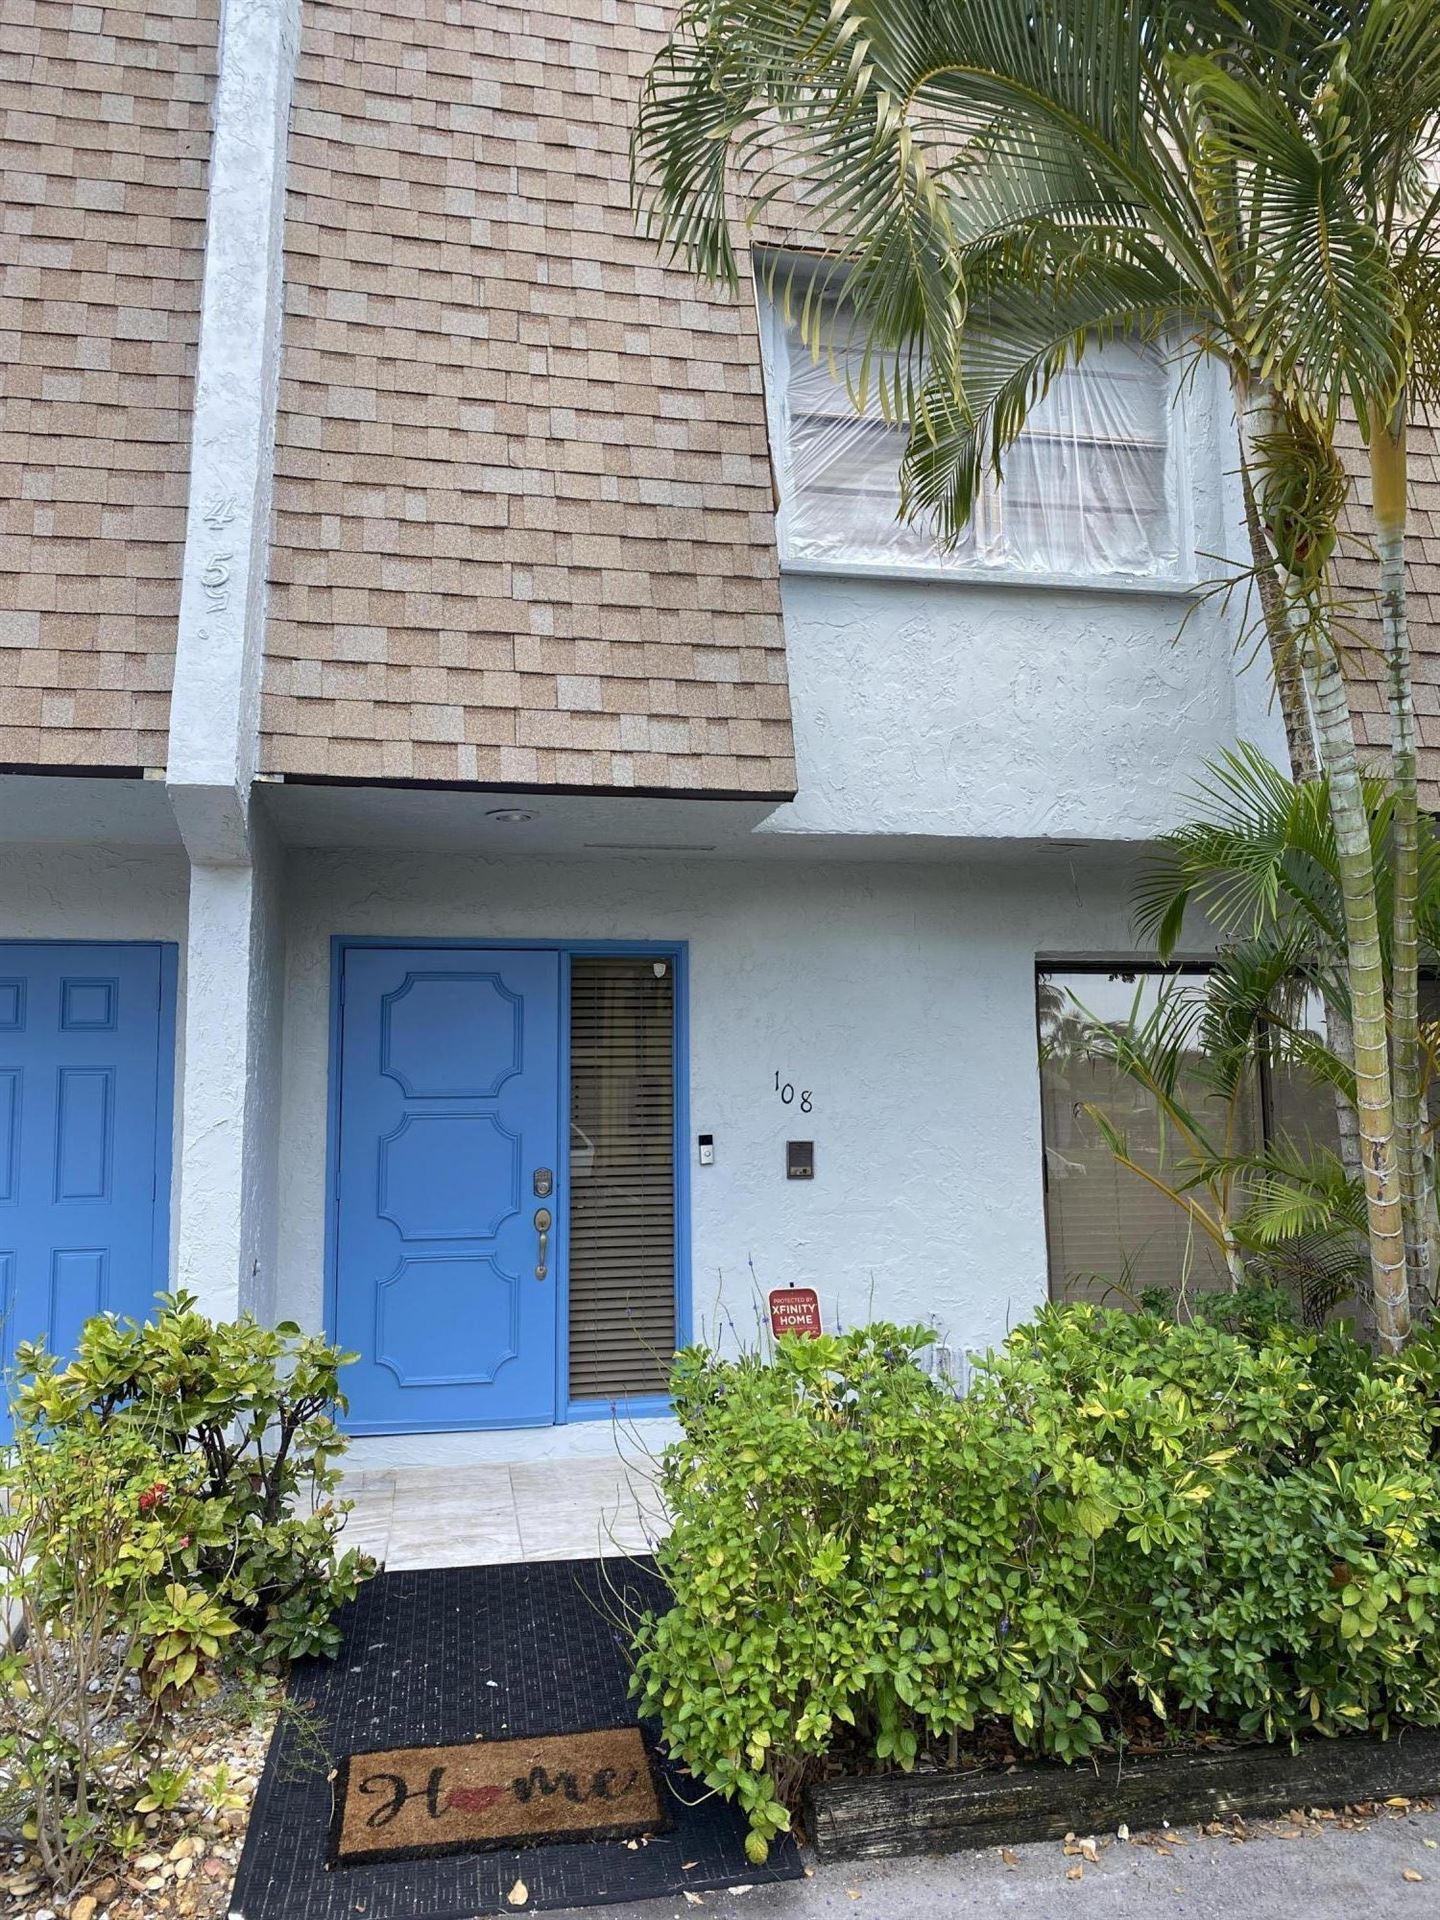 455 Canal Point N #108, Delray Beach, FL 33444 - #: RX-10658447